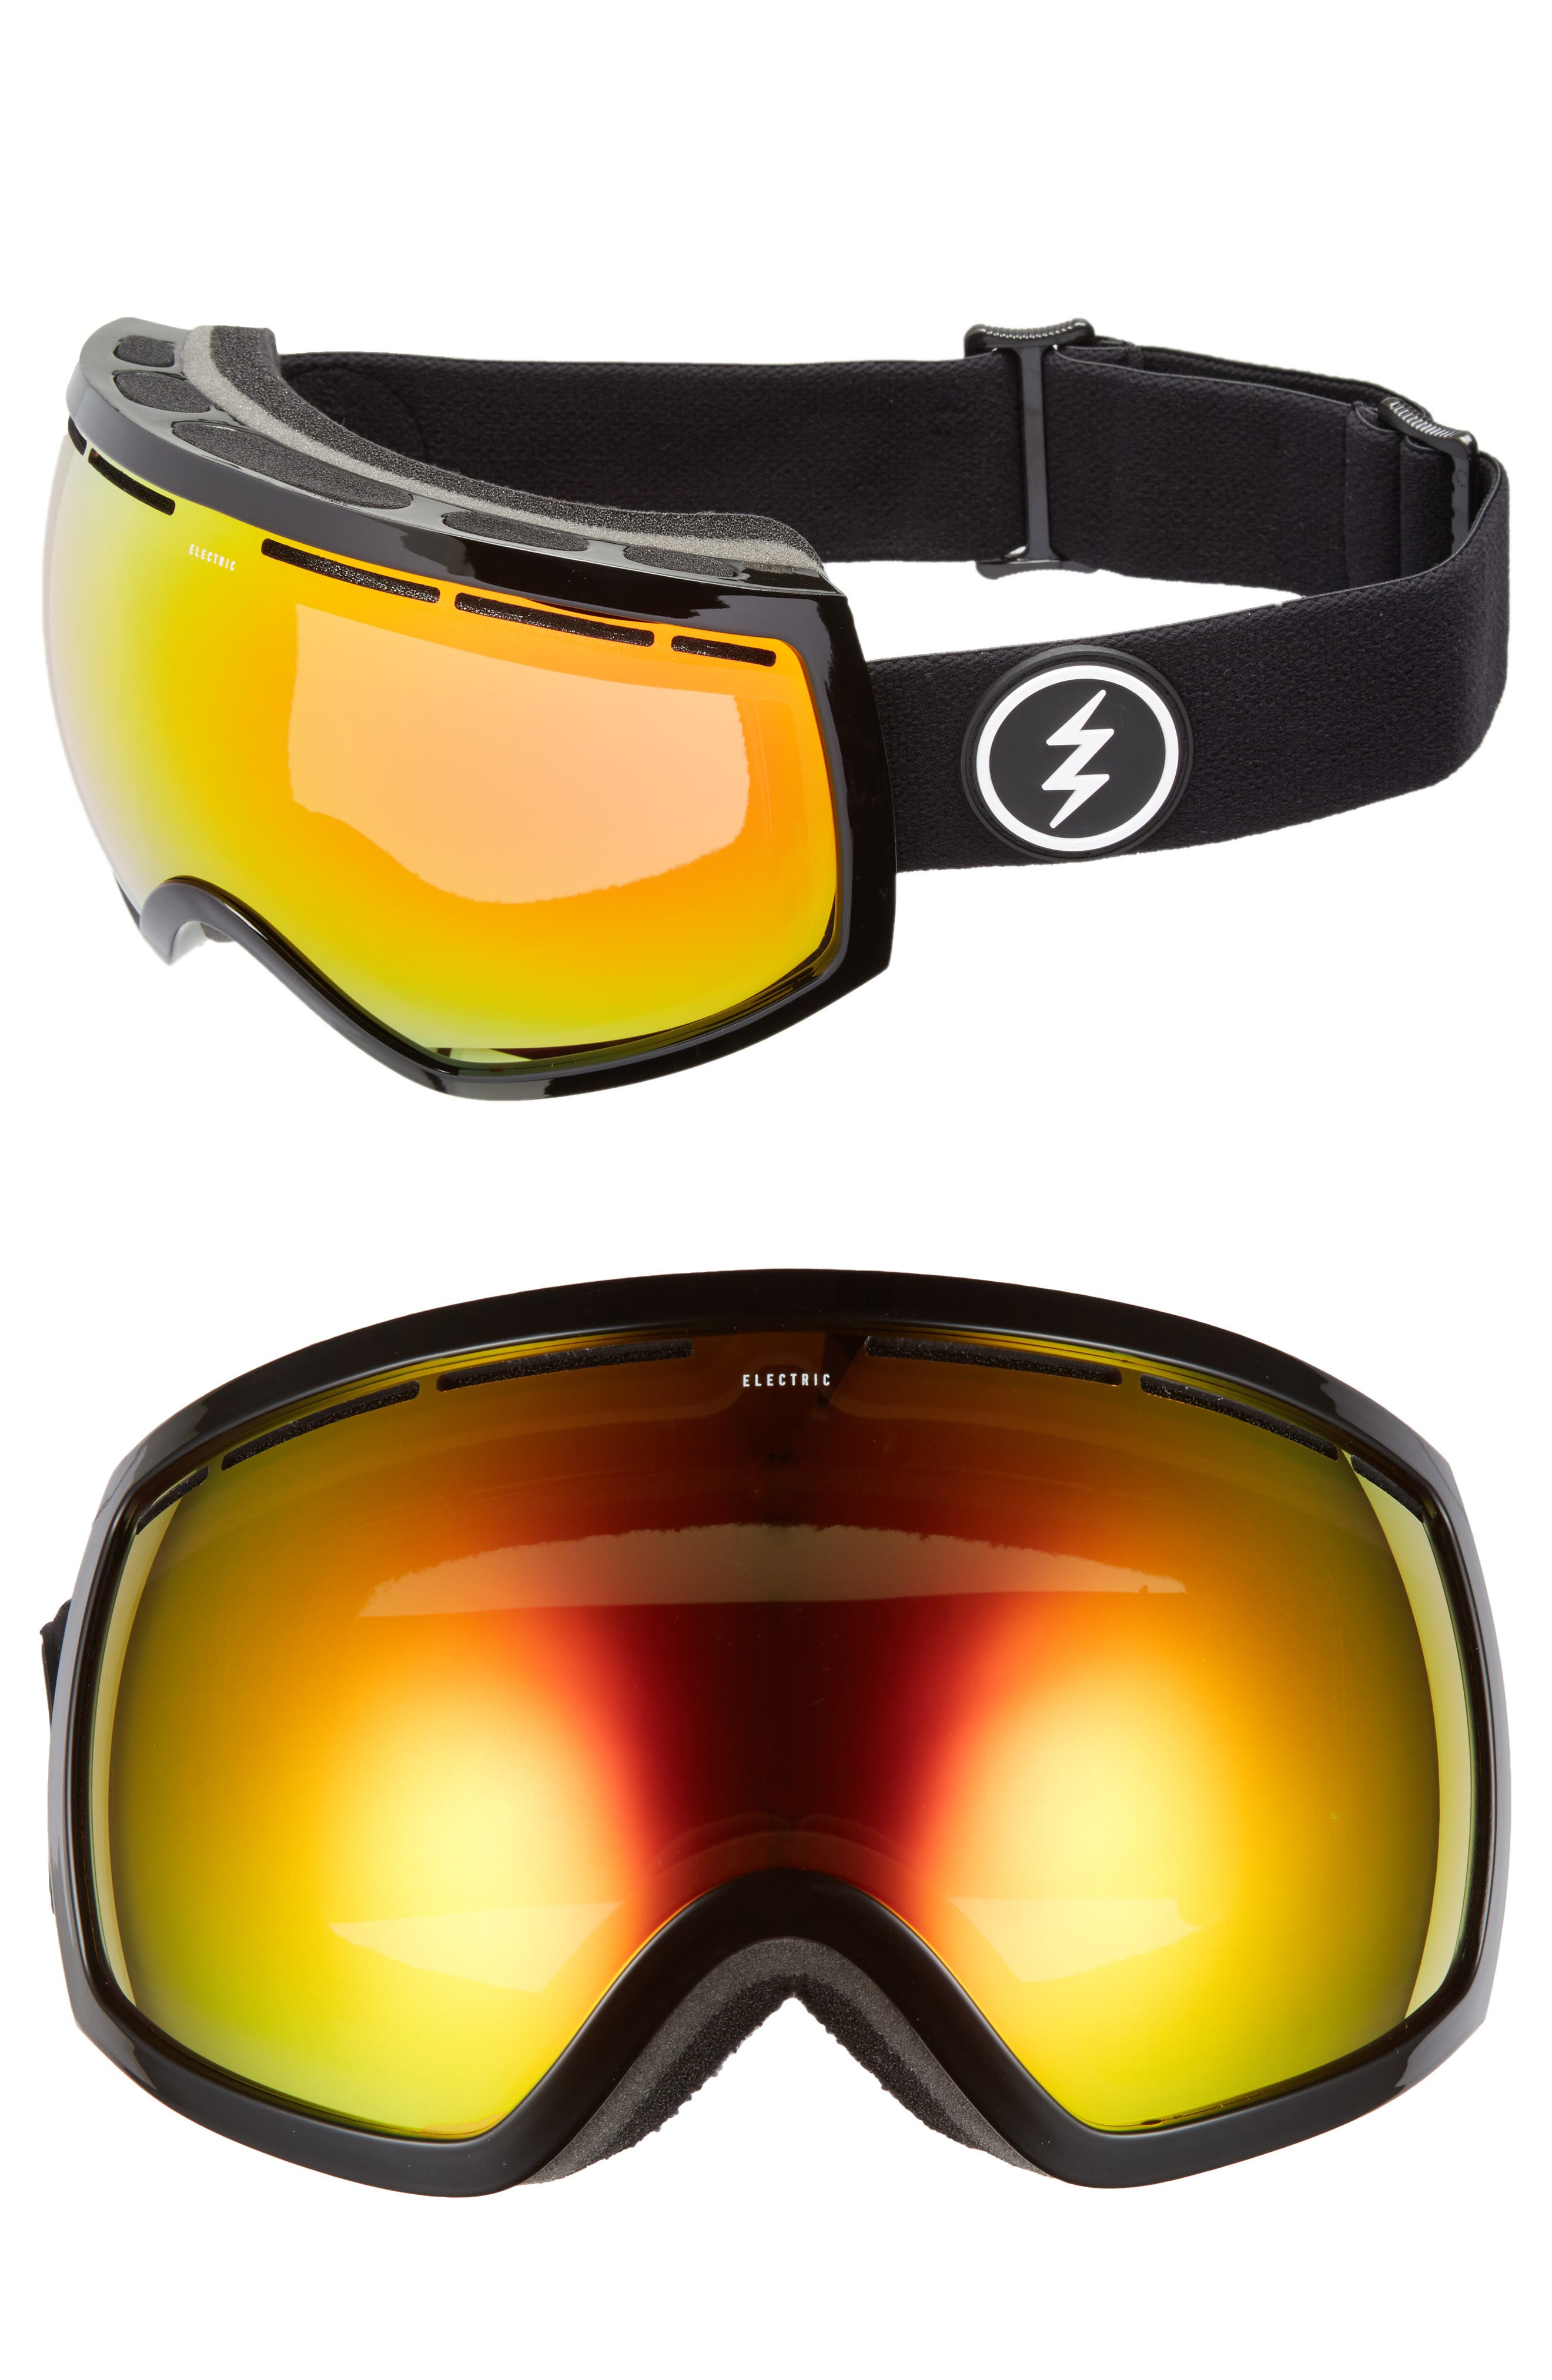 Main Image - ELECTRIC EG2 Snow Goggles